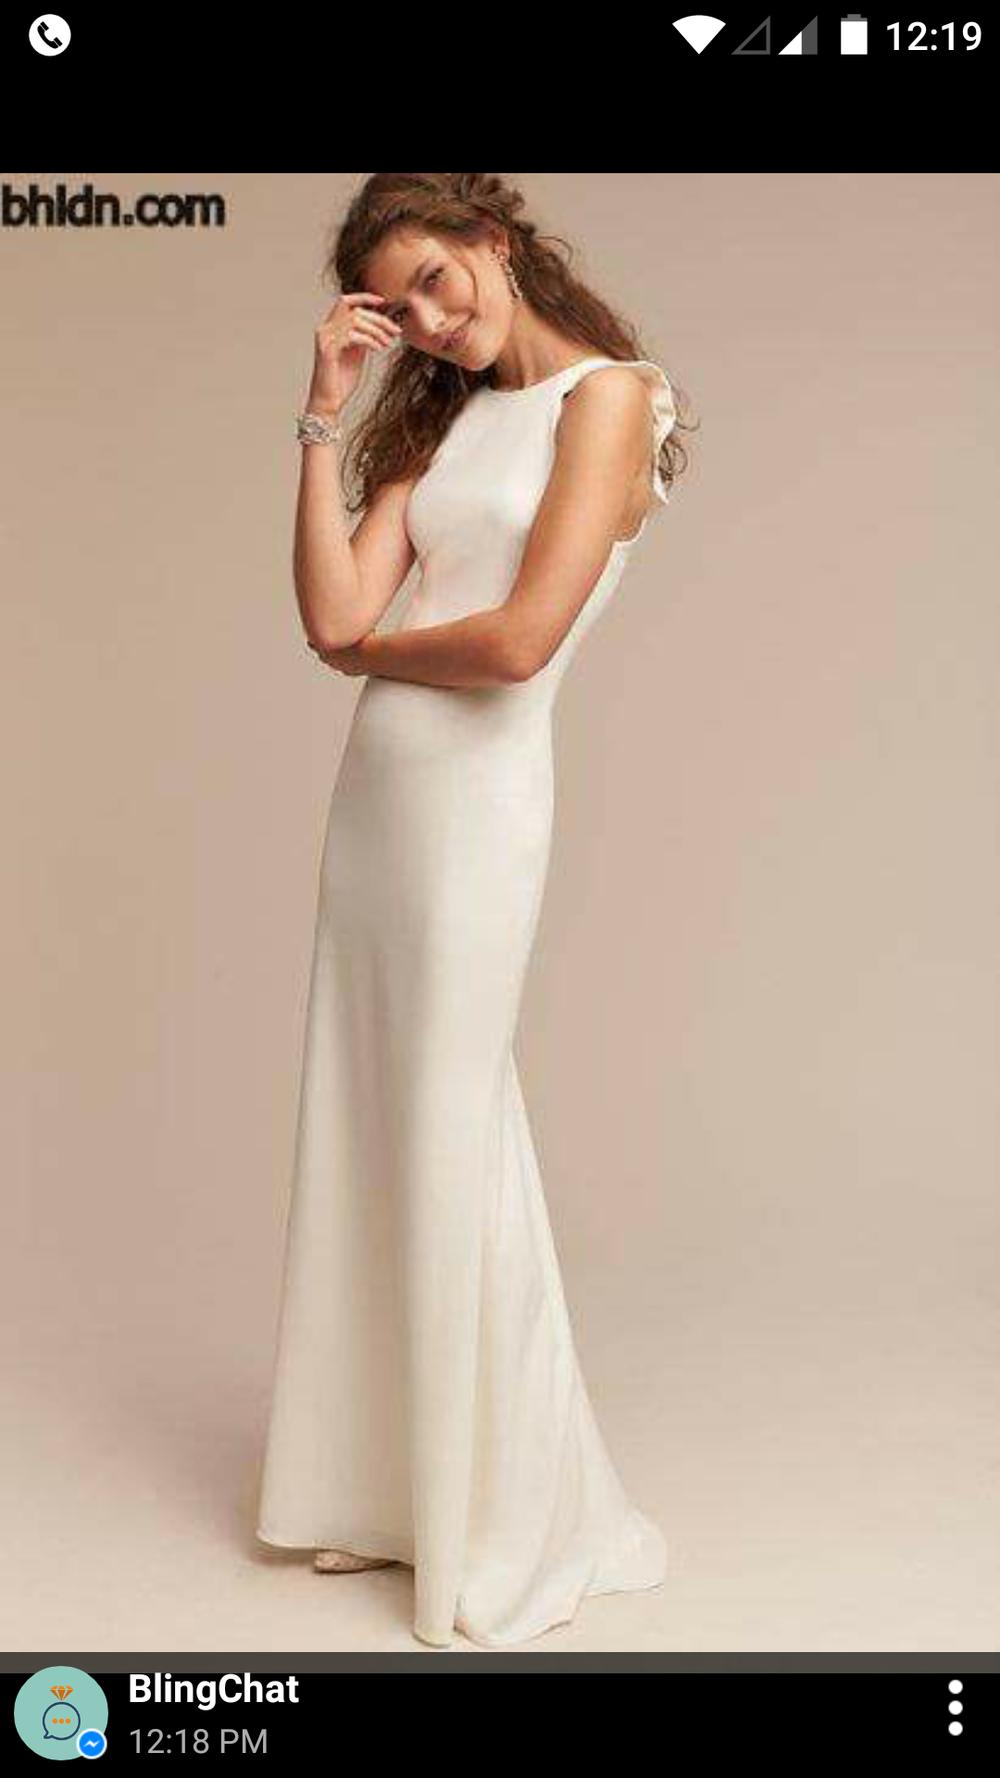 Wedding Dress 2 source